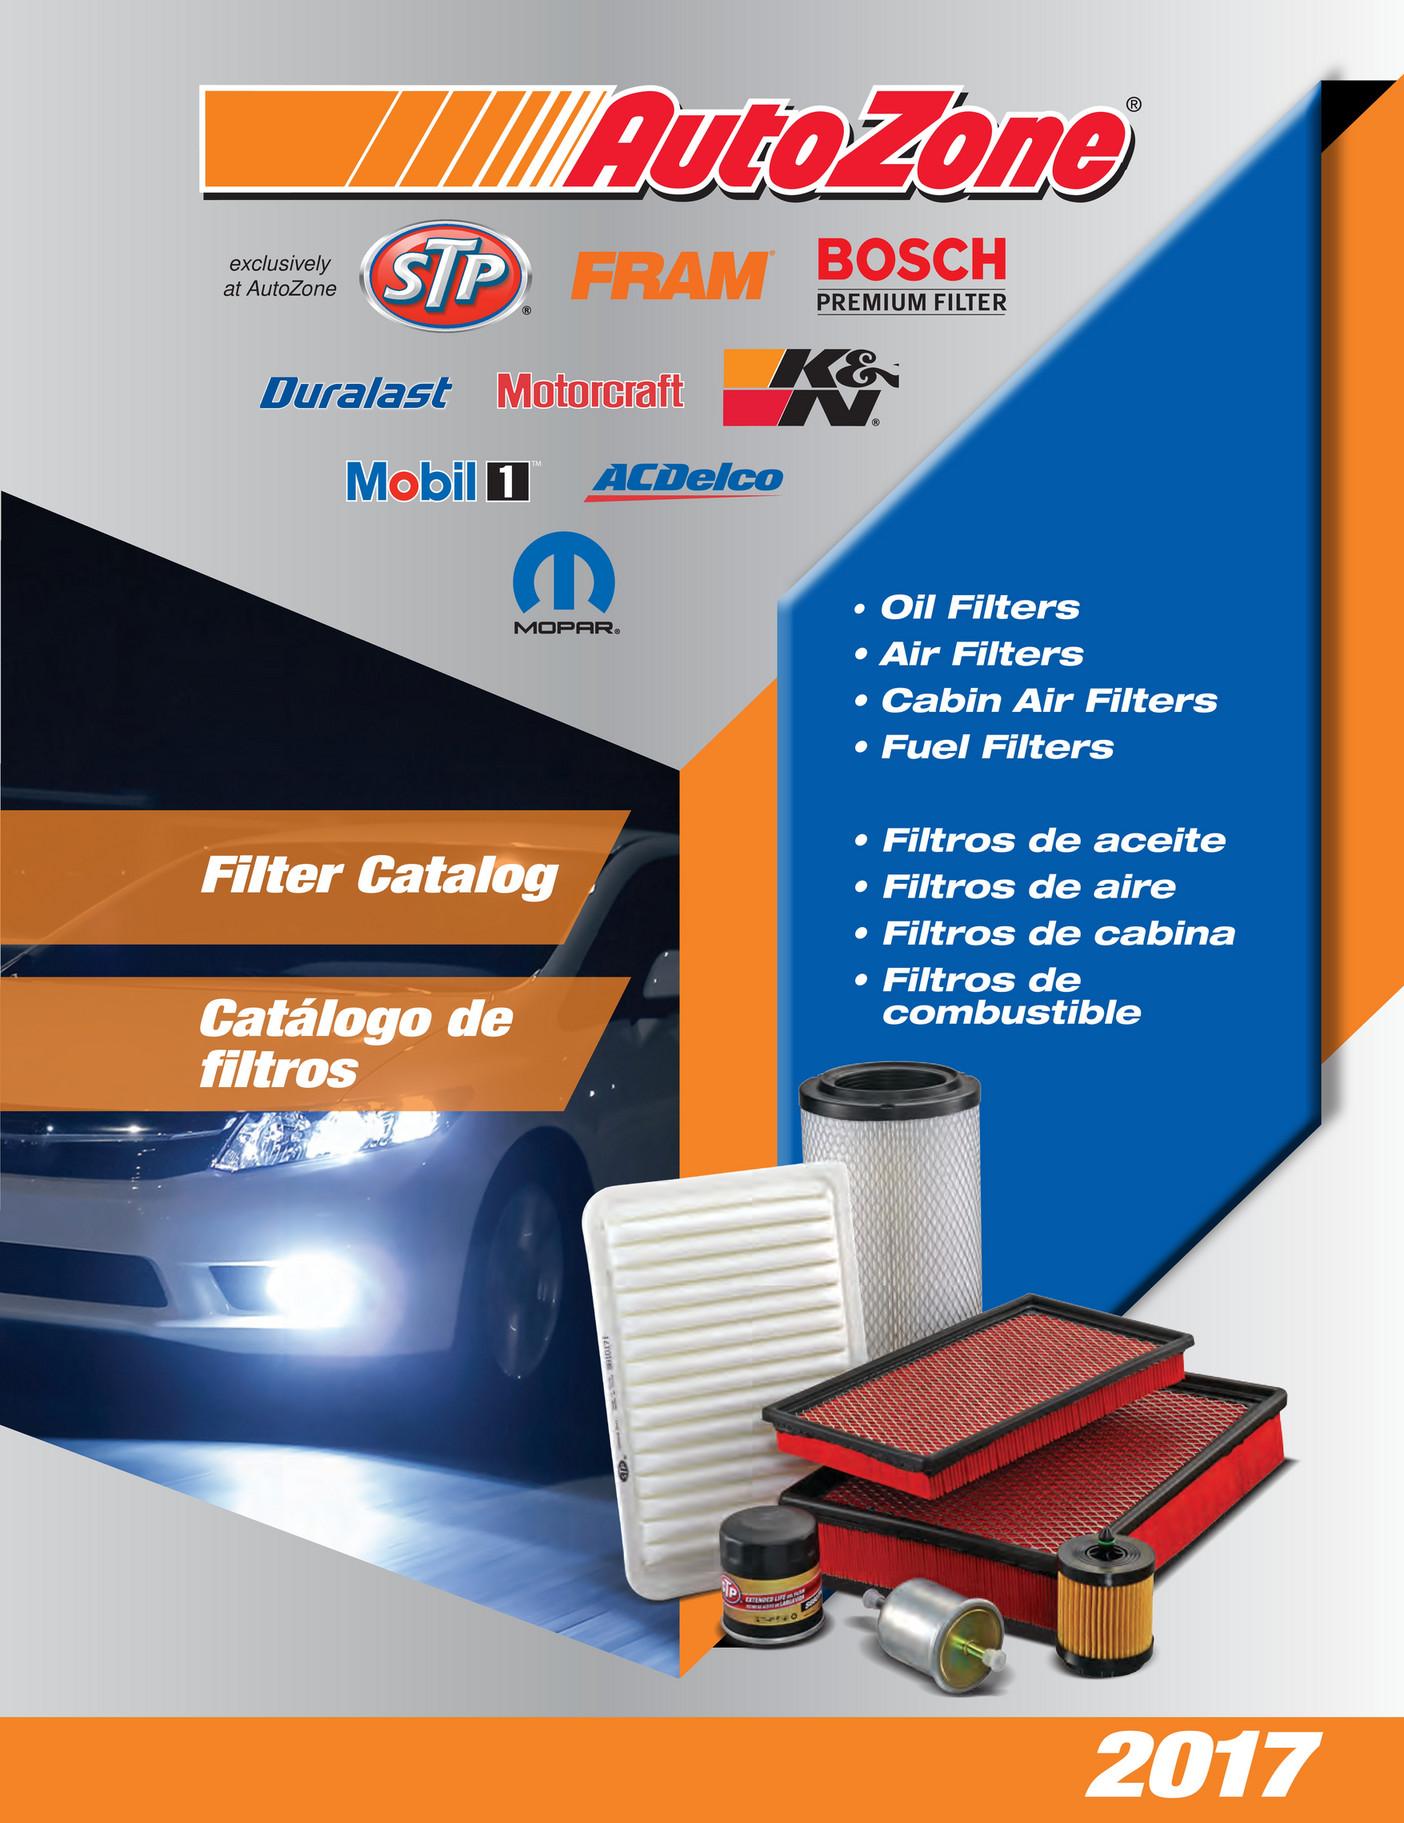 Champion Labs - 2017 AutoZone Automotive Catalog - Page 810-811